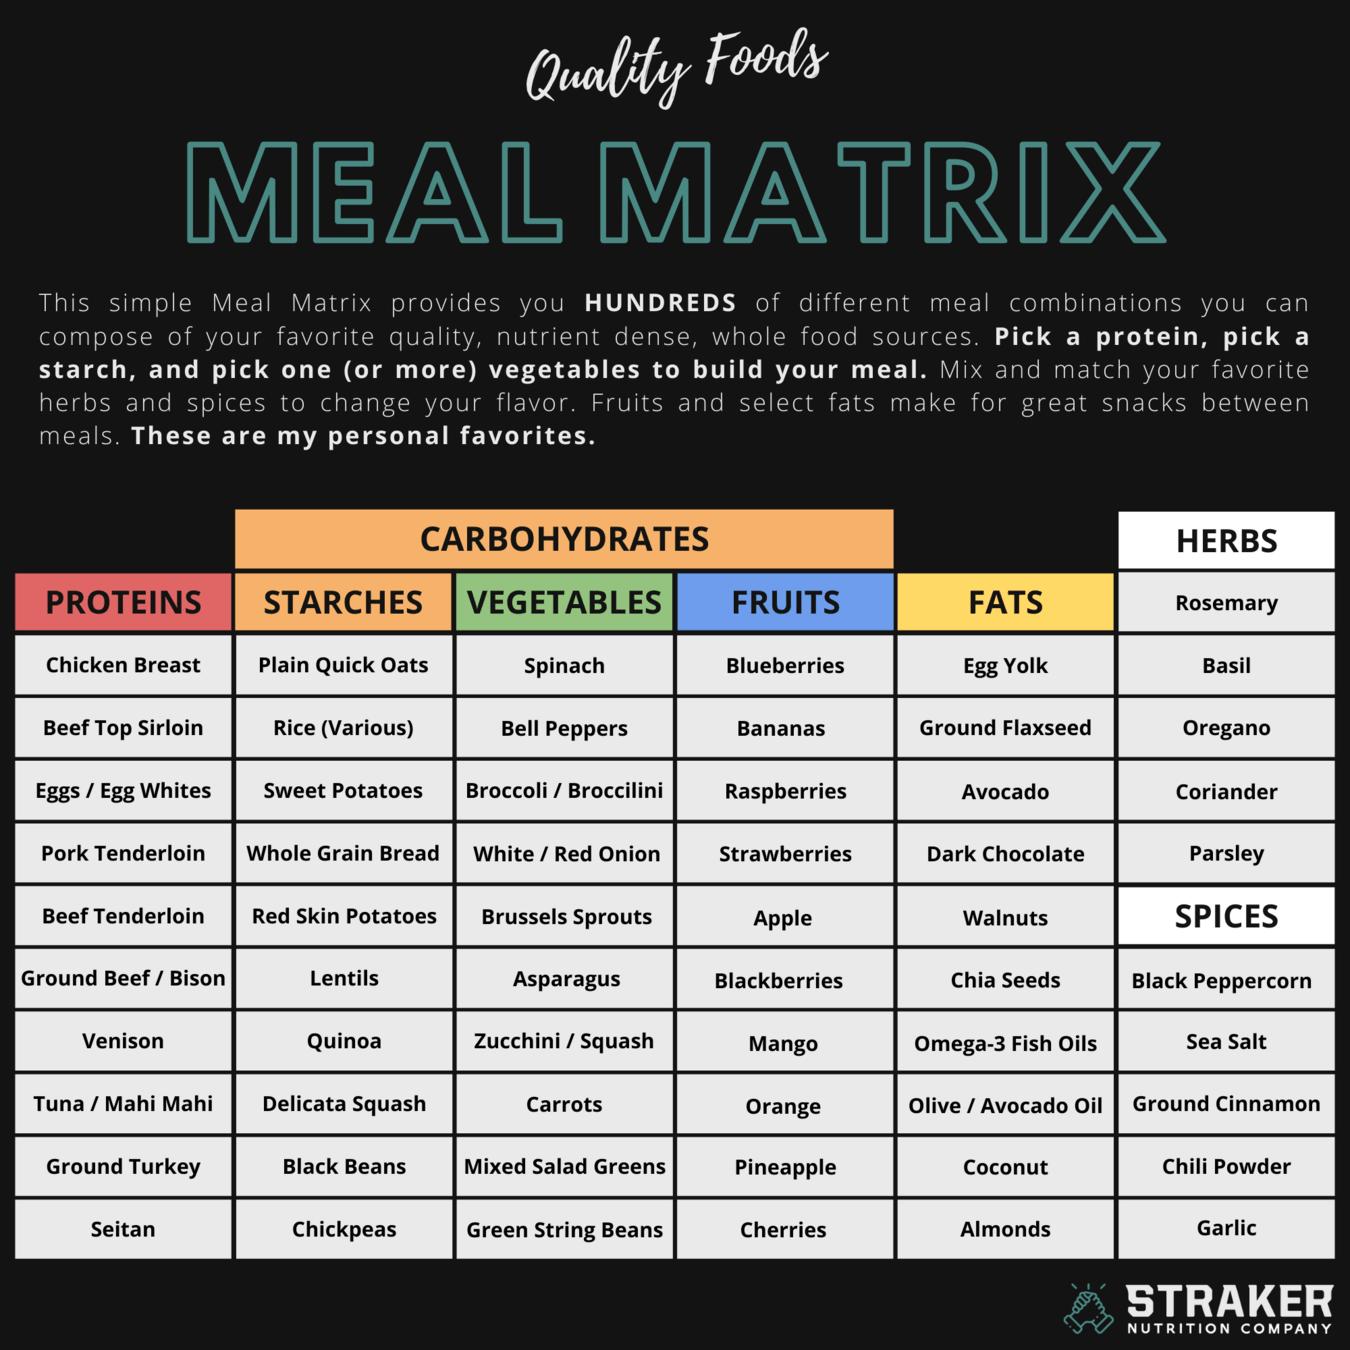 Aaron Meal Matrix 2.0 - 2000x2000